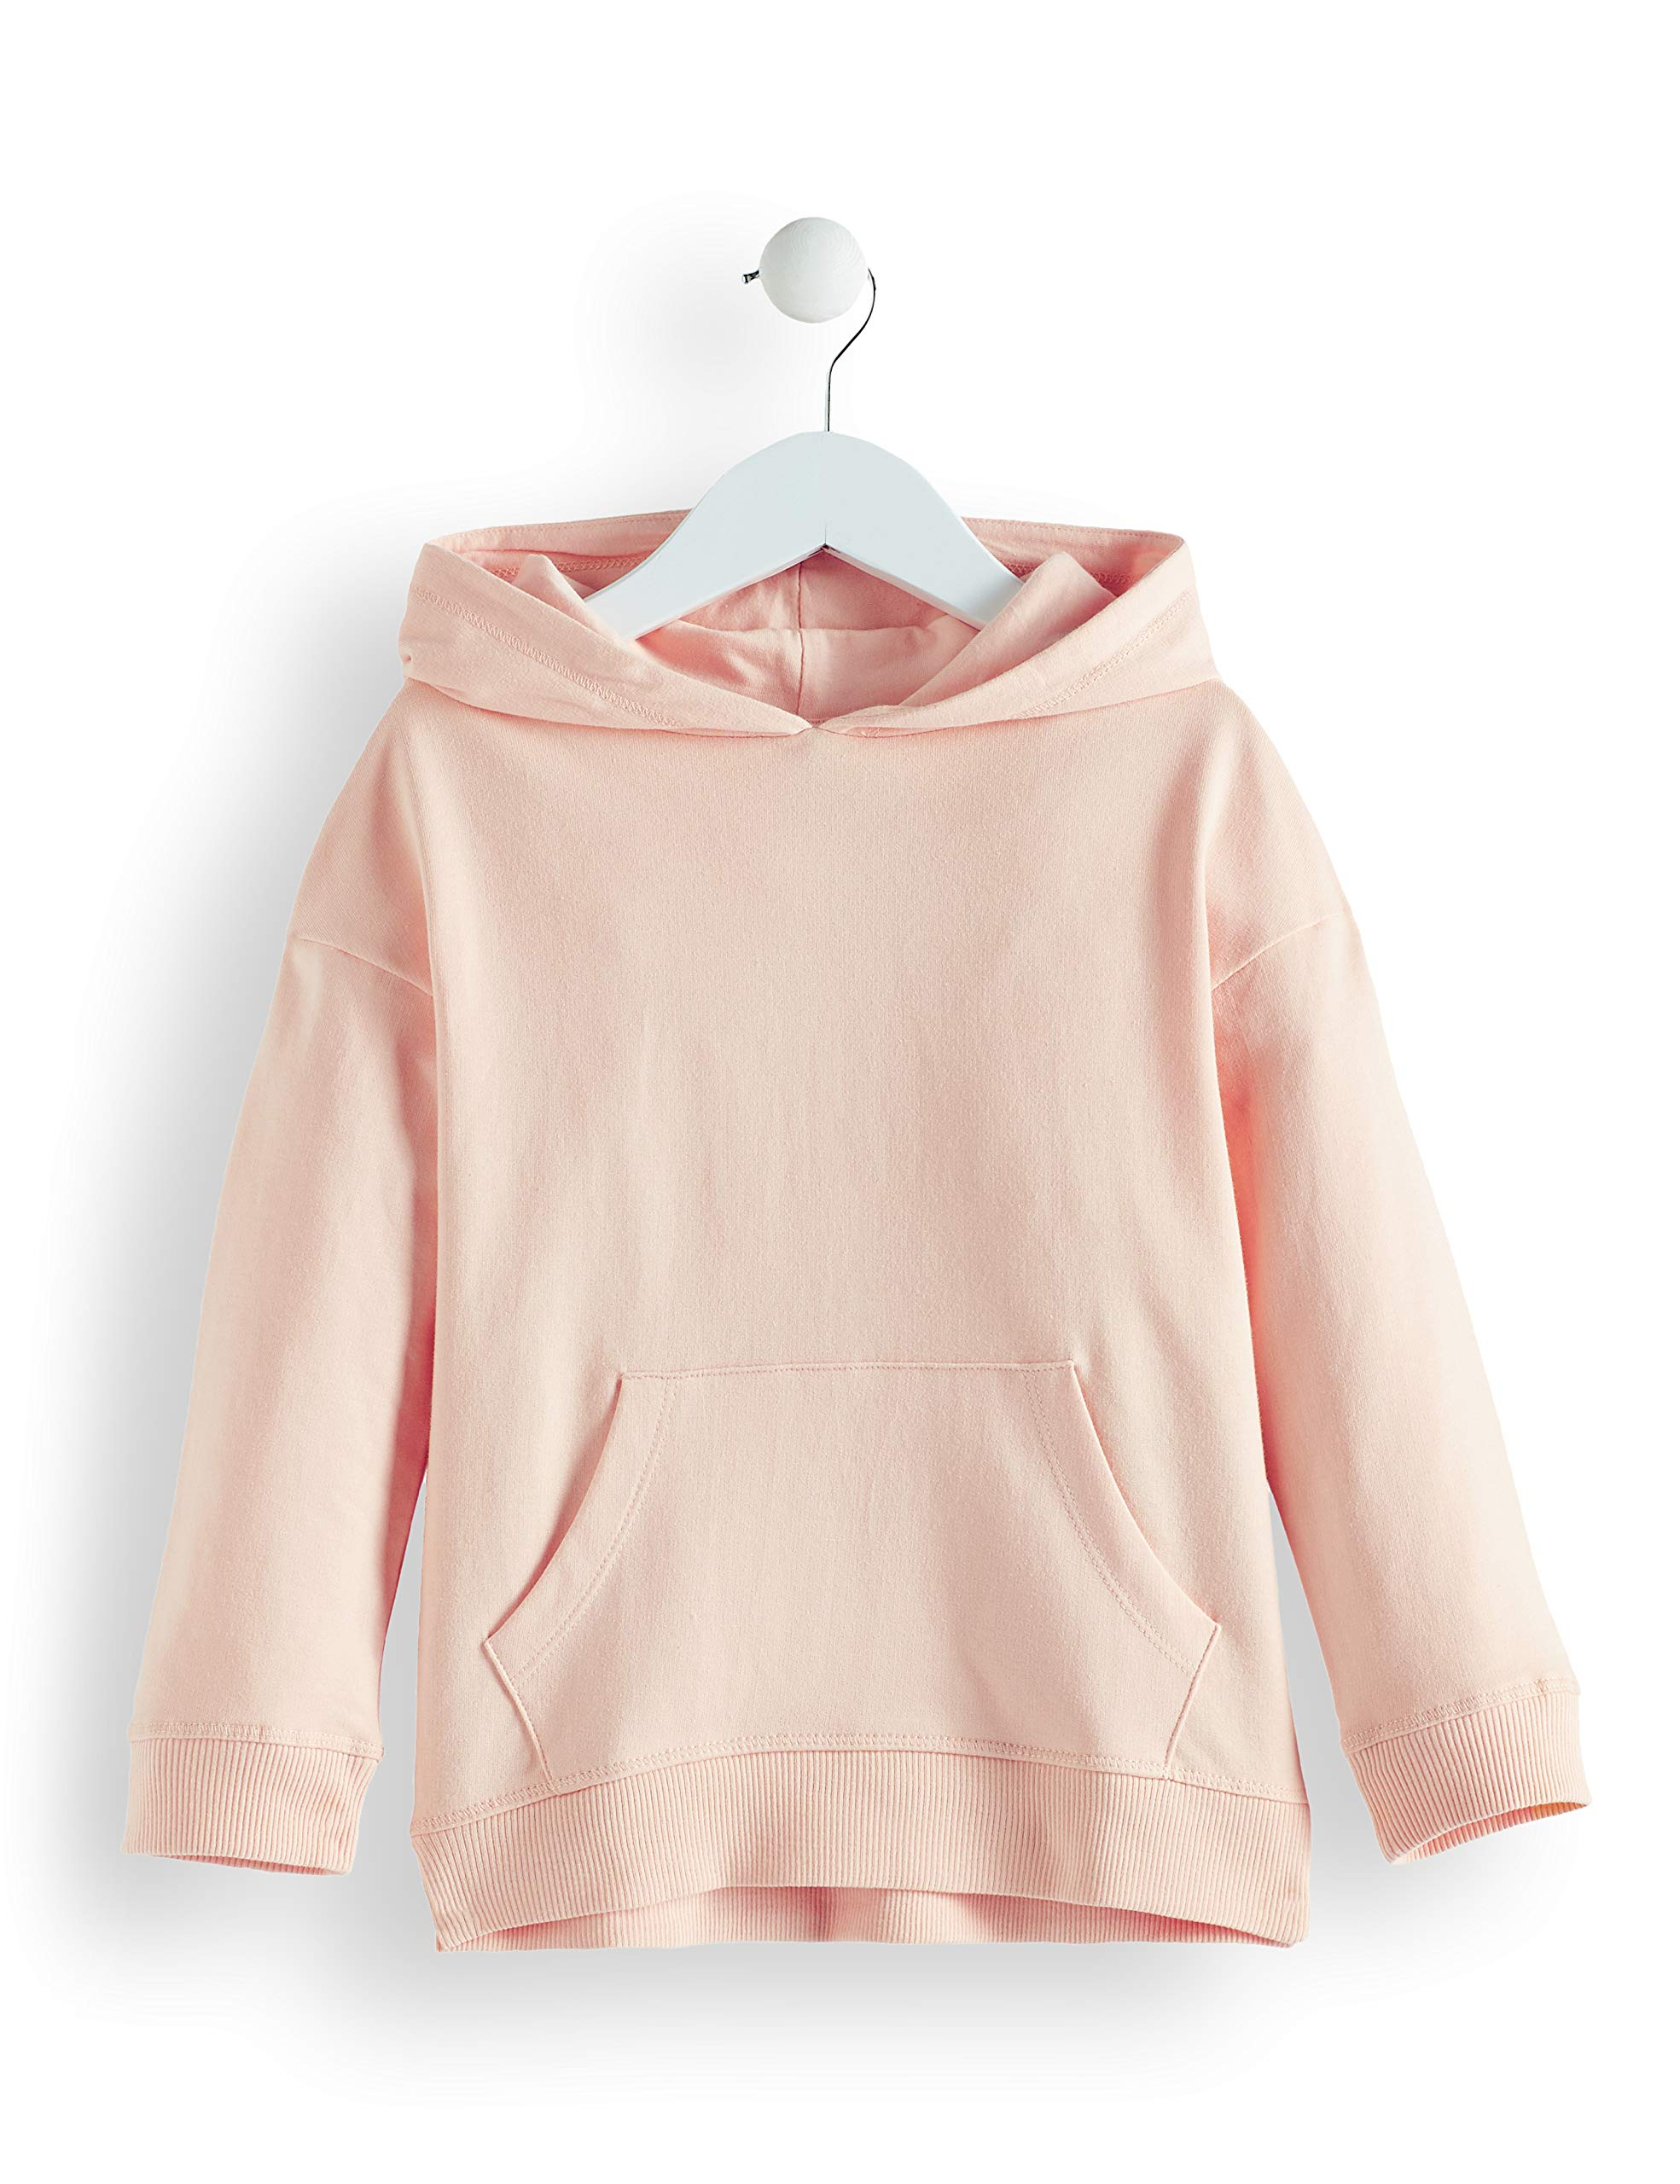 Peppa Wutz Kinder Mädchen Kapuzenpullover Hoodie Kostüm Sweatshirt Jacke Mantel